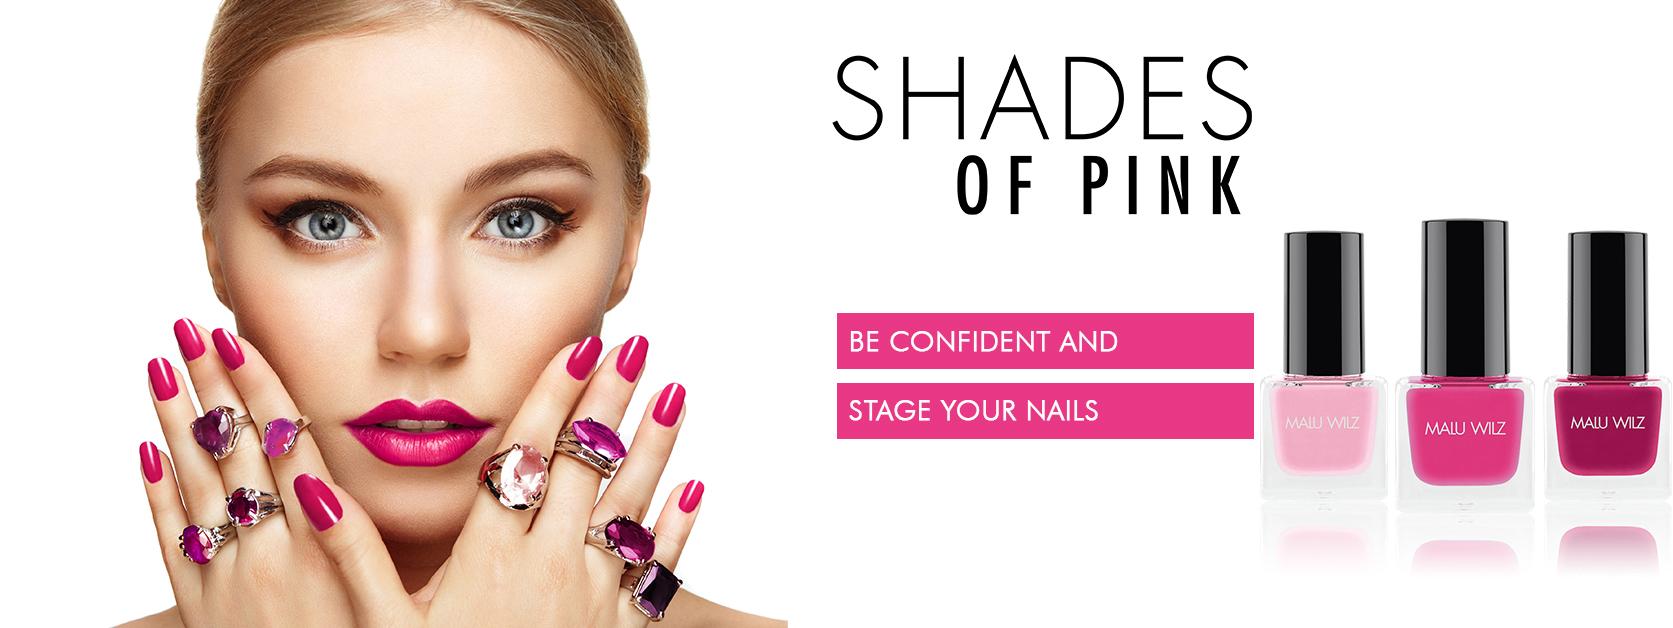 young woman with nail polish